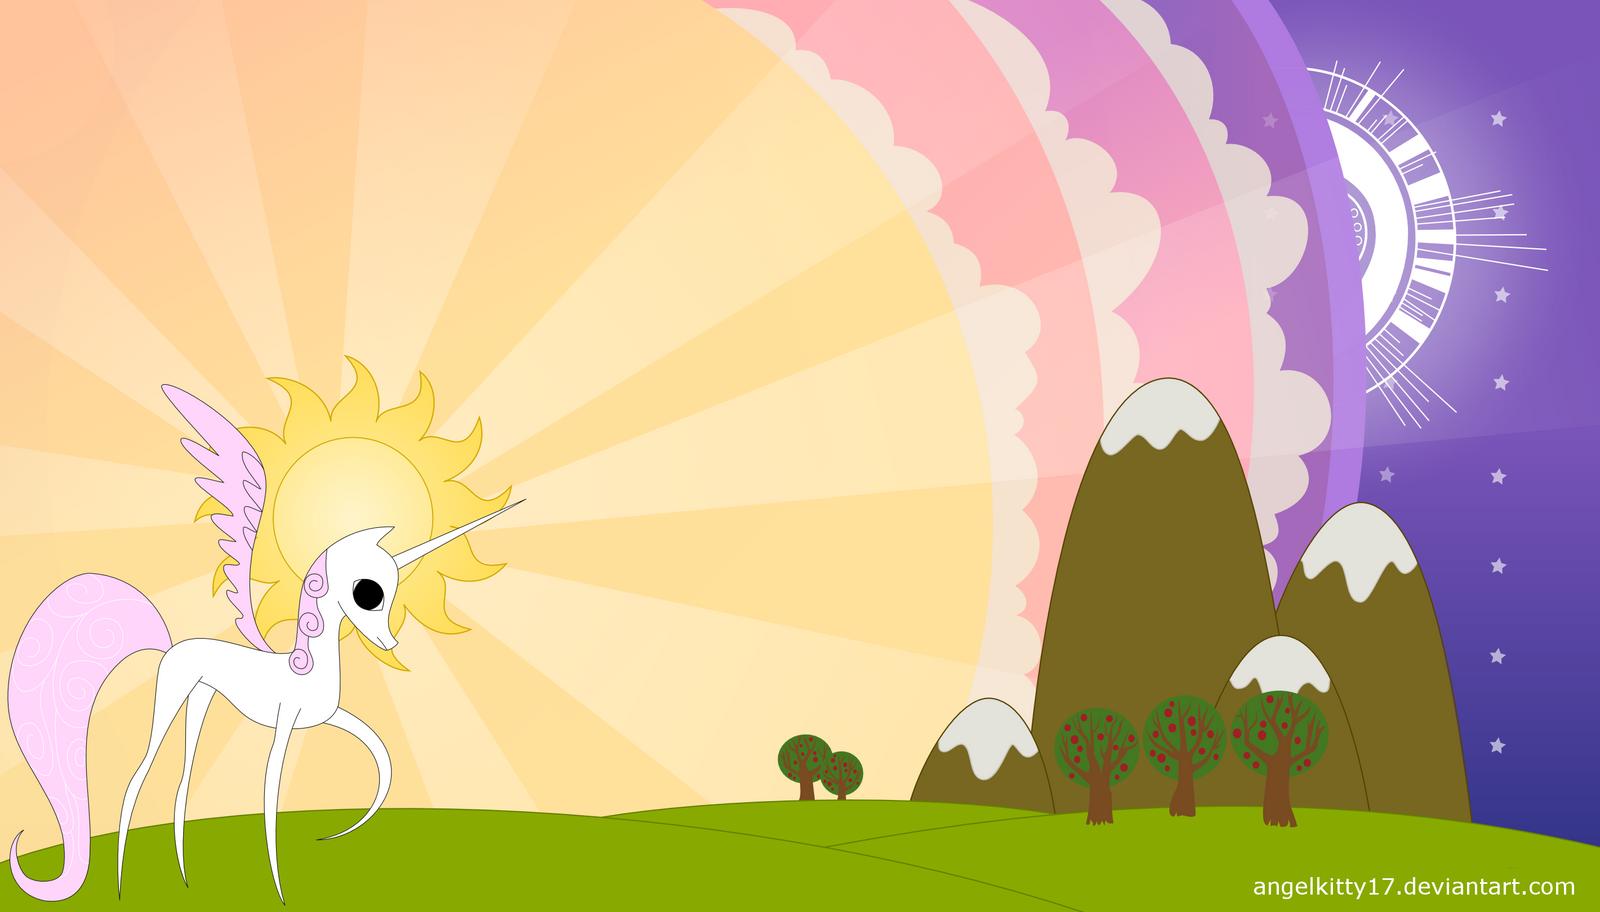 Legendary Solar Goddess by Angelkitty17